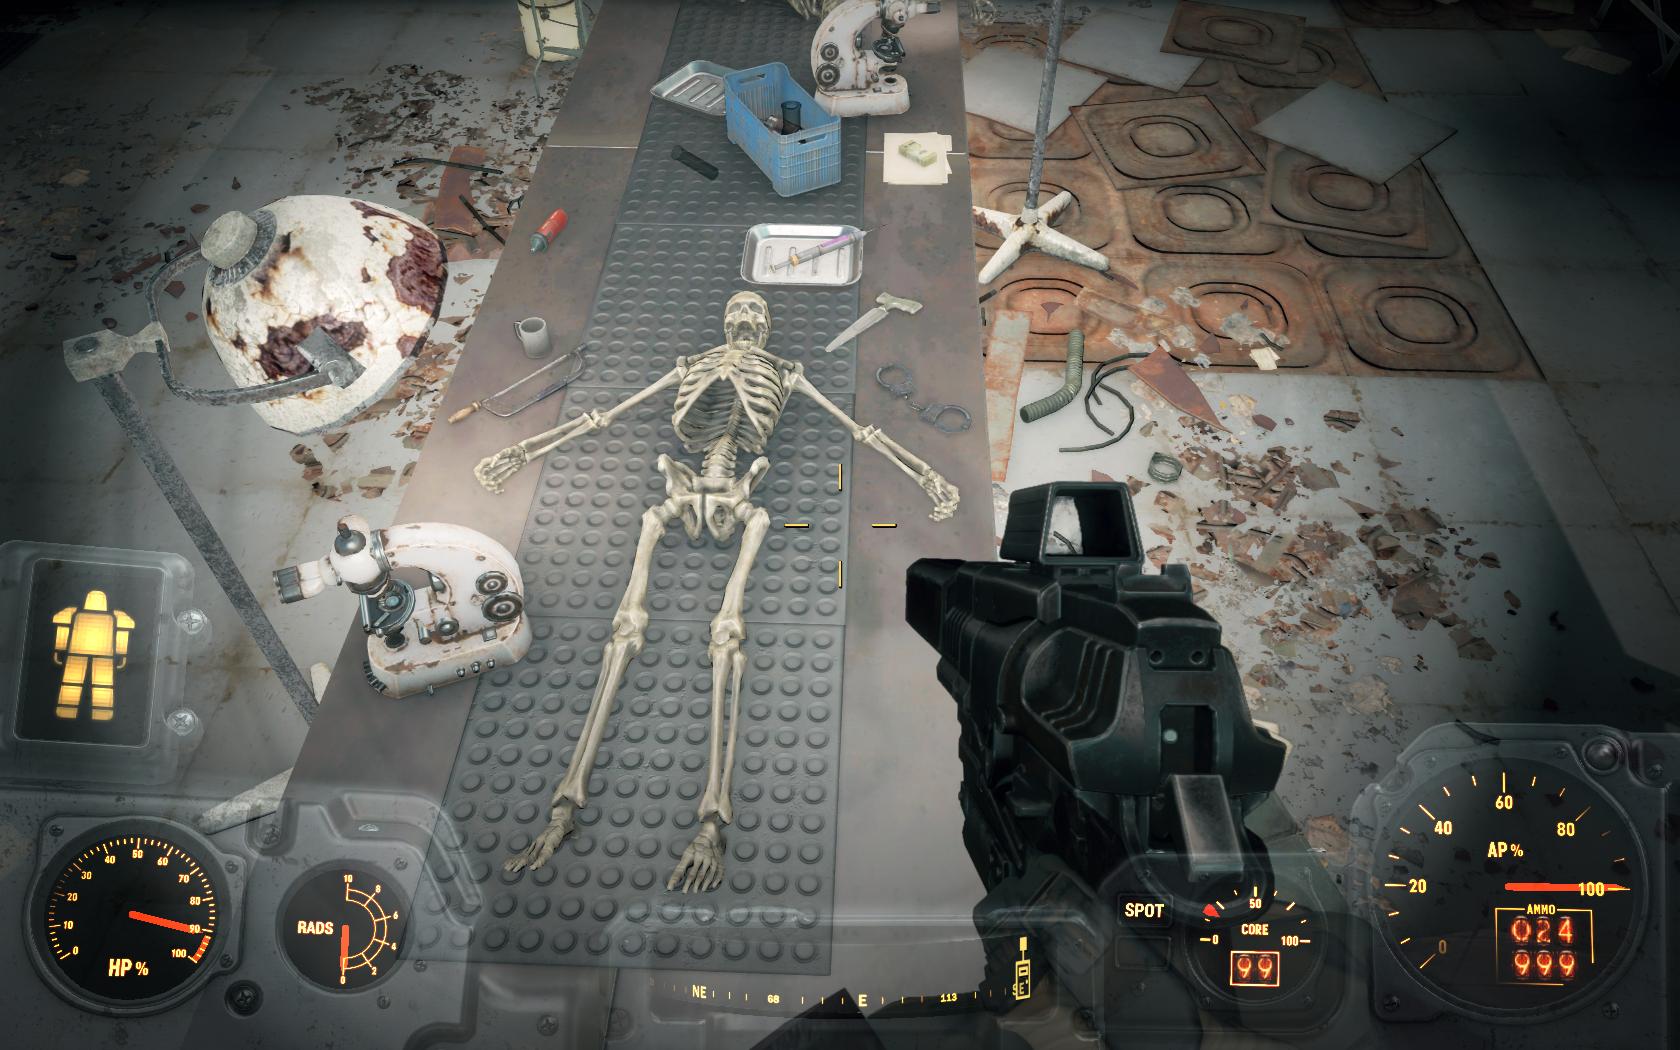 Операция с элементами насилия (Мед-Тек Рисёрч) - Fallout 4 Кость, Скелет